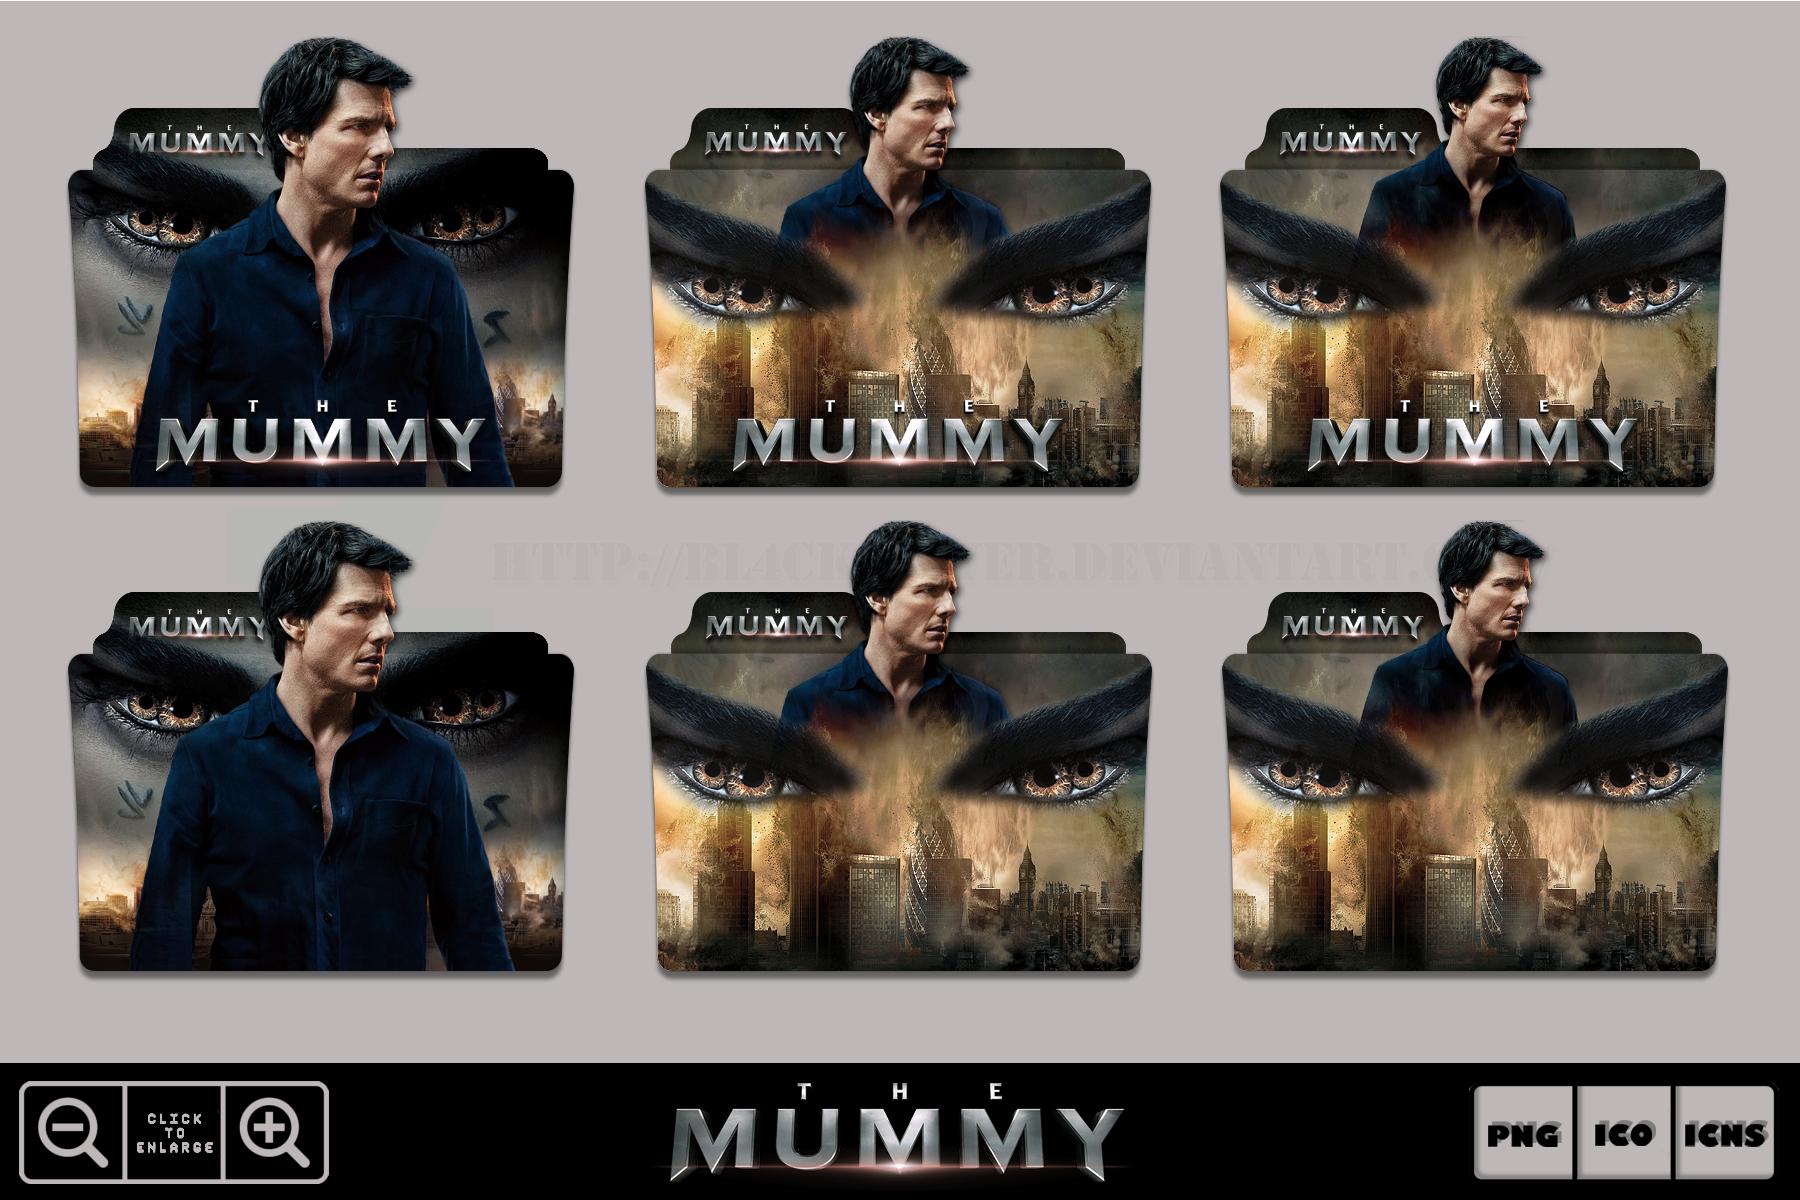 The Mummy 2017 Folder Icon Pack By Bl4cksl4yer On Deviantart